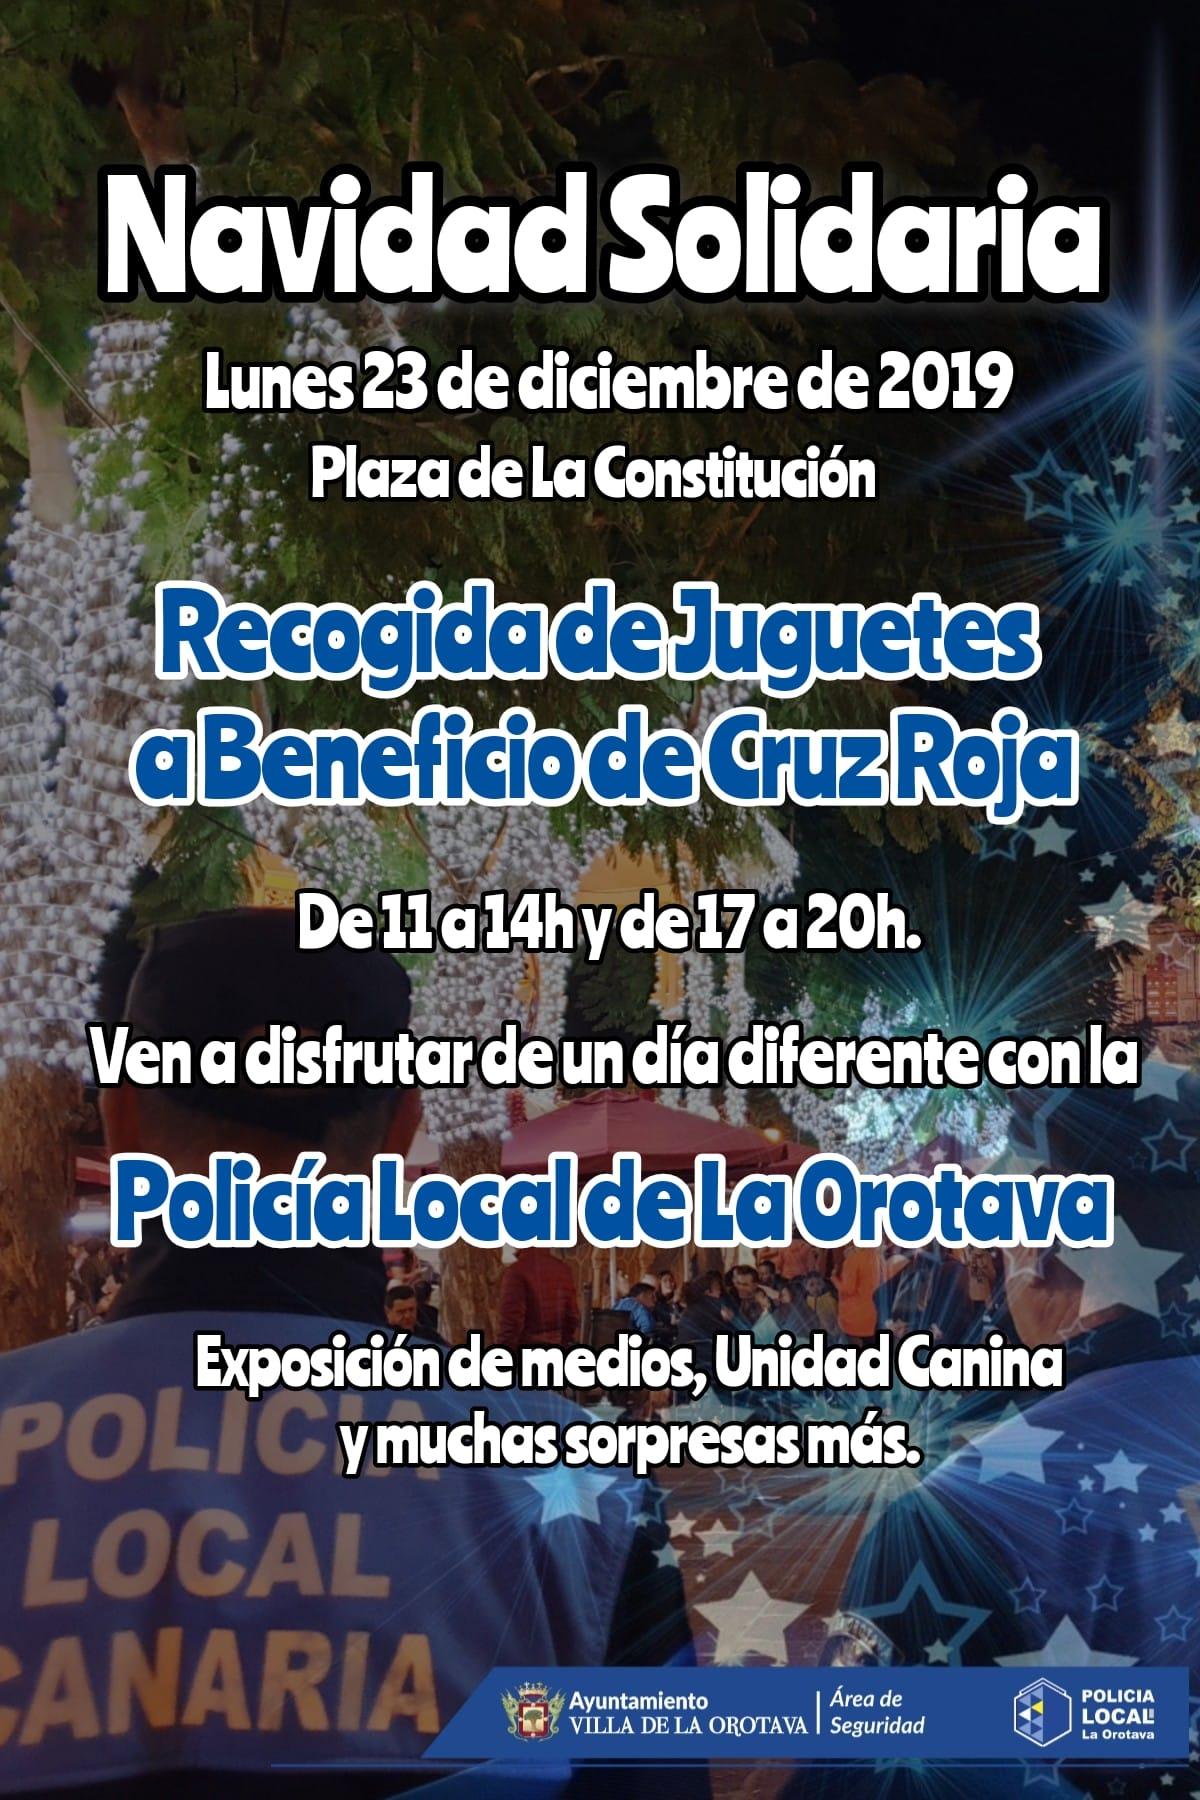 La Policía Local de La Orotava organiza una recogida solidaria de juguetes a favor de Cruz Roja